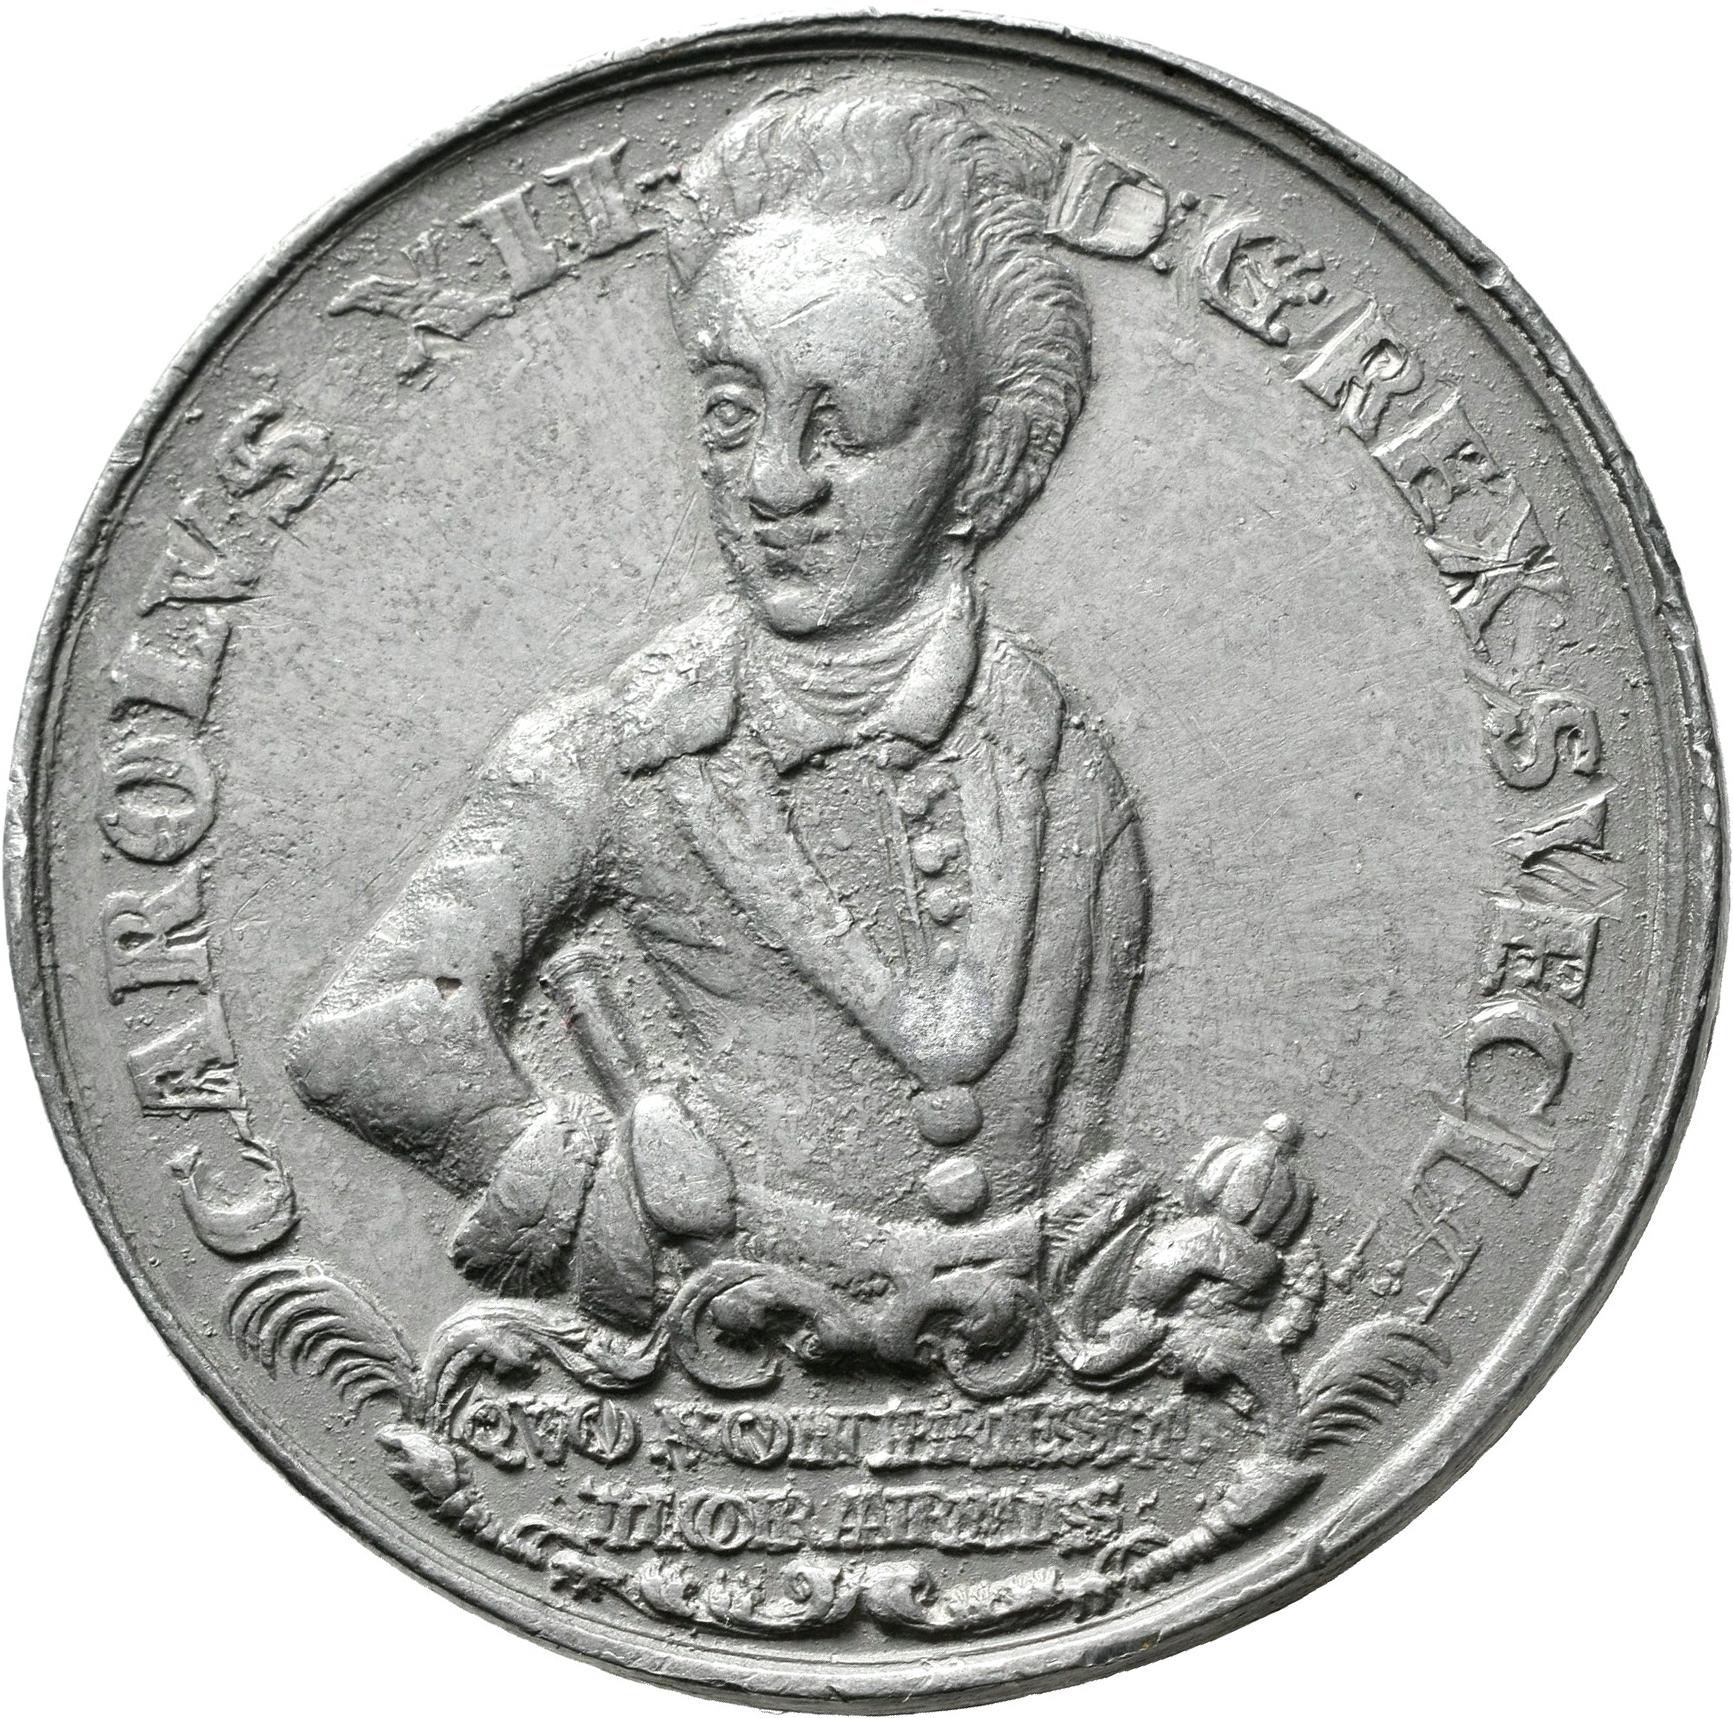 Lot 03224 - Schweden | Europa  -  Auktionshaus Christoph Gärtner GmbH & Co. KG Sale #46 Numismatics of the 46th Christoph Gärtner Auction